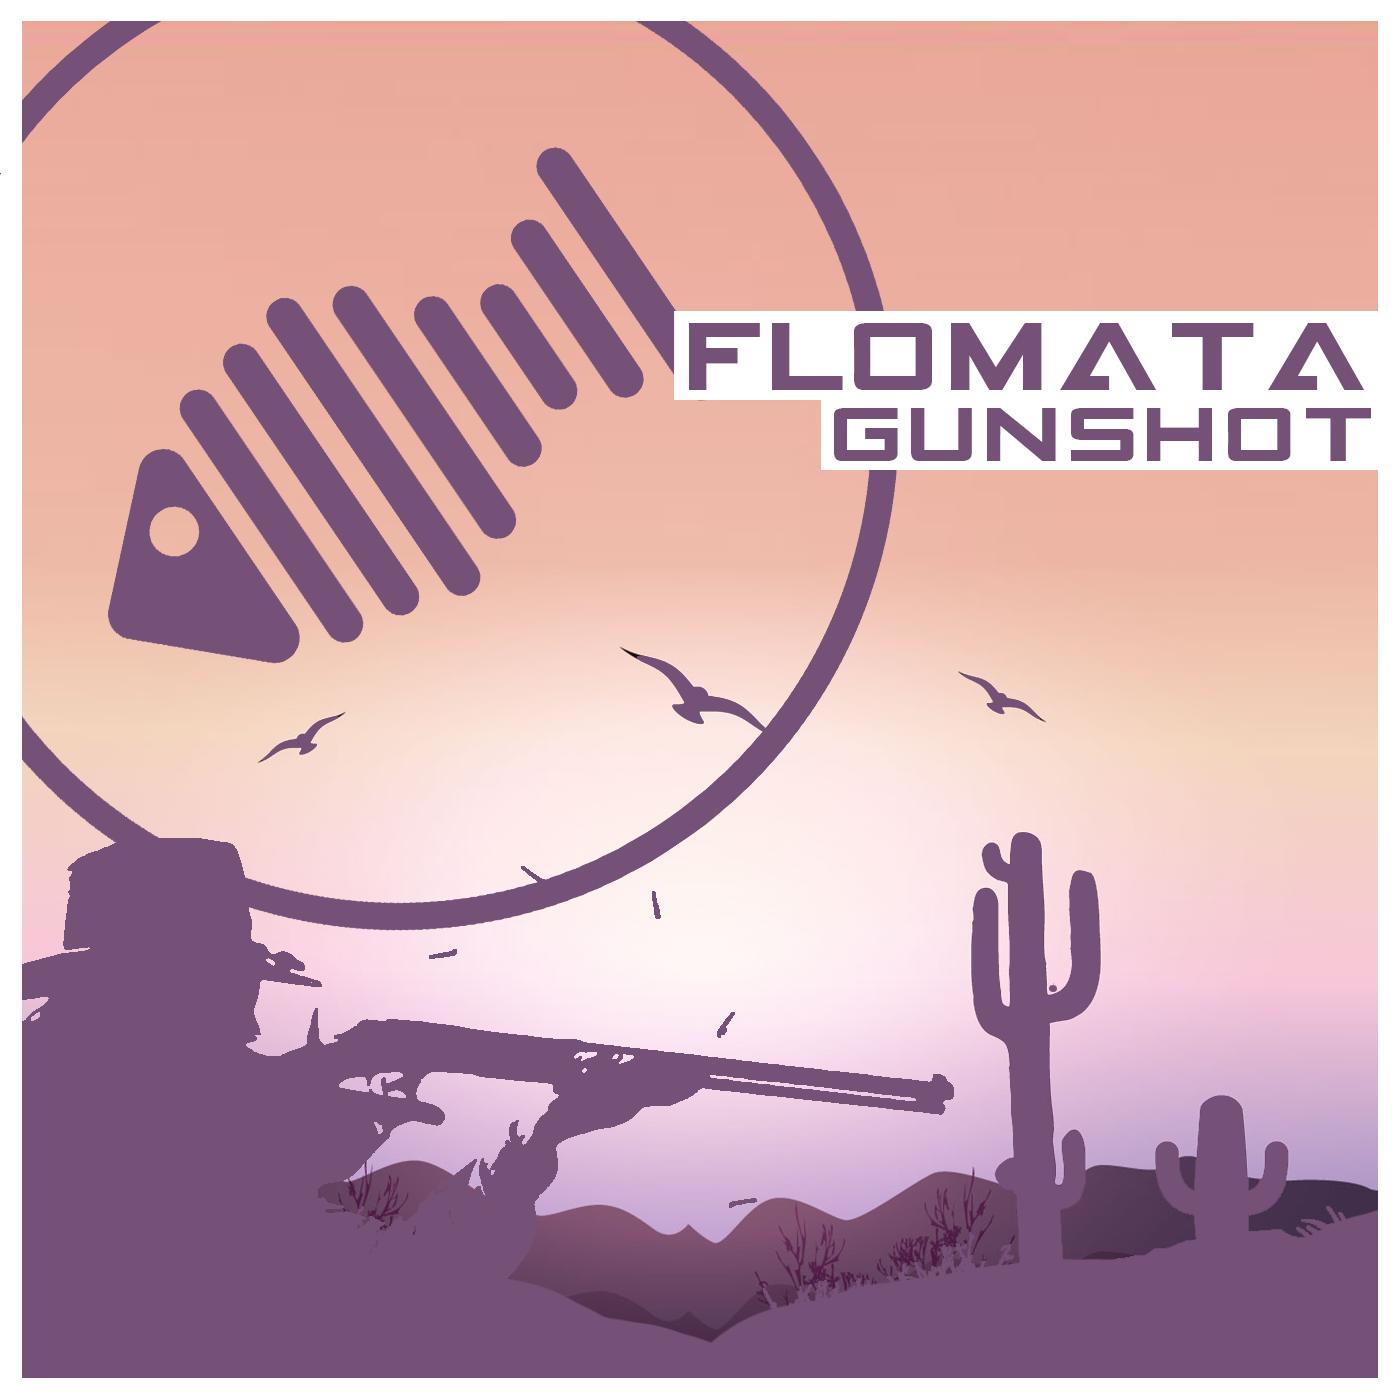 Flomata-Gunshot